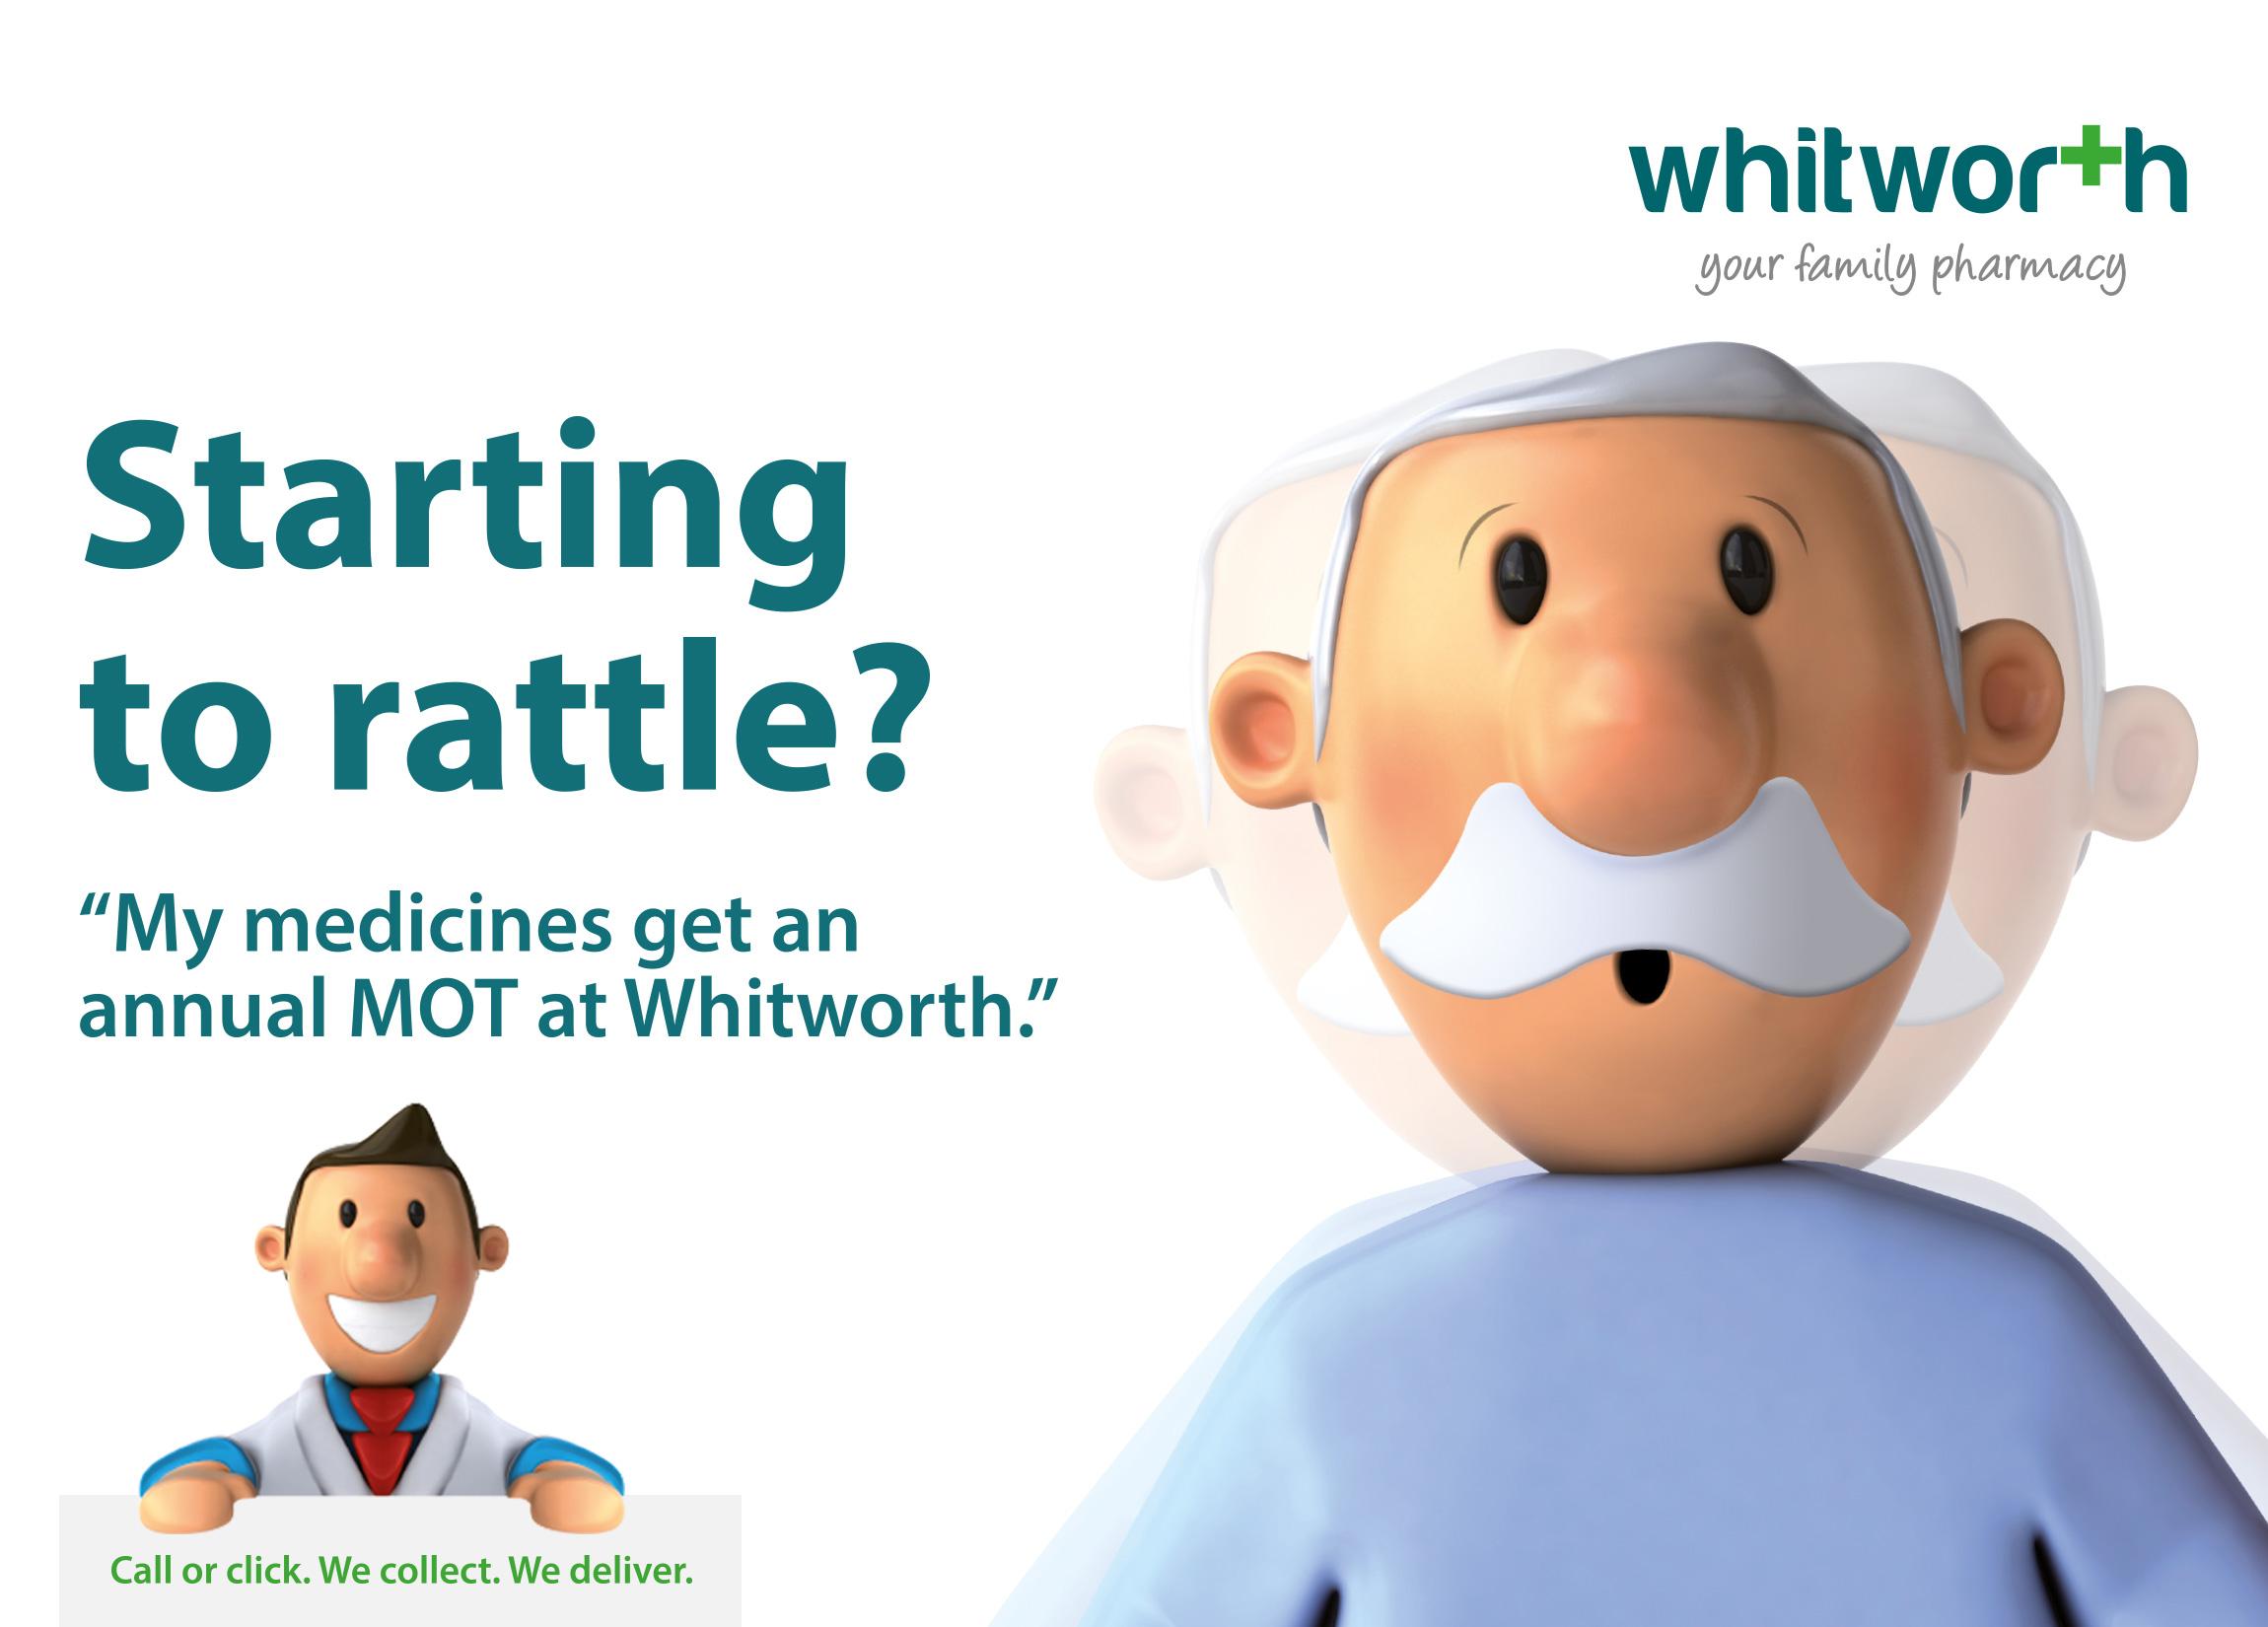 Brand Building – Whitworth Family Pharmacy